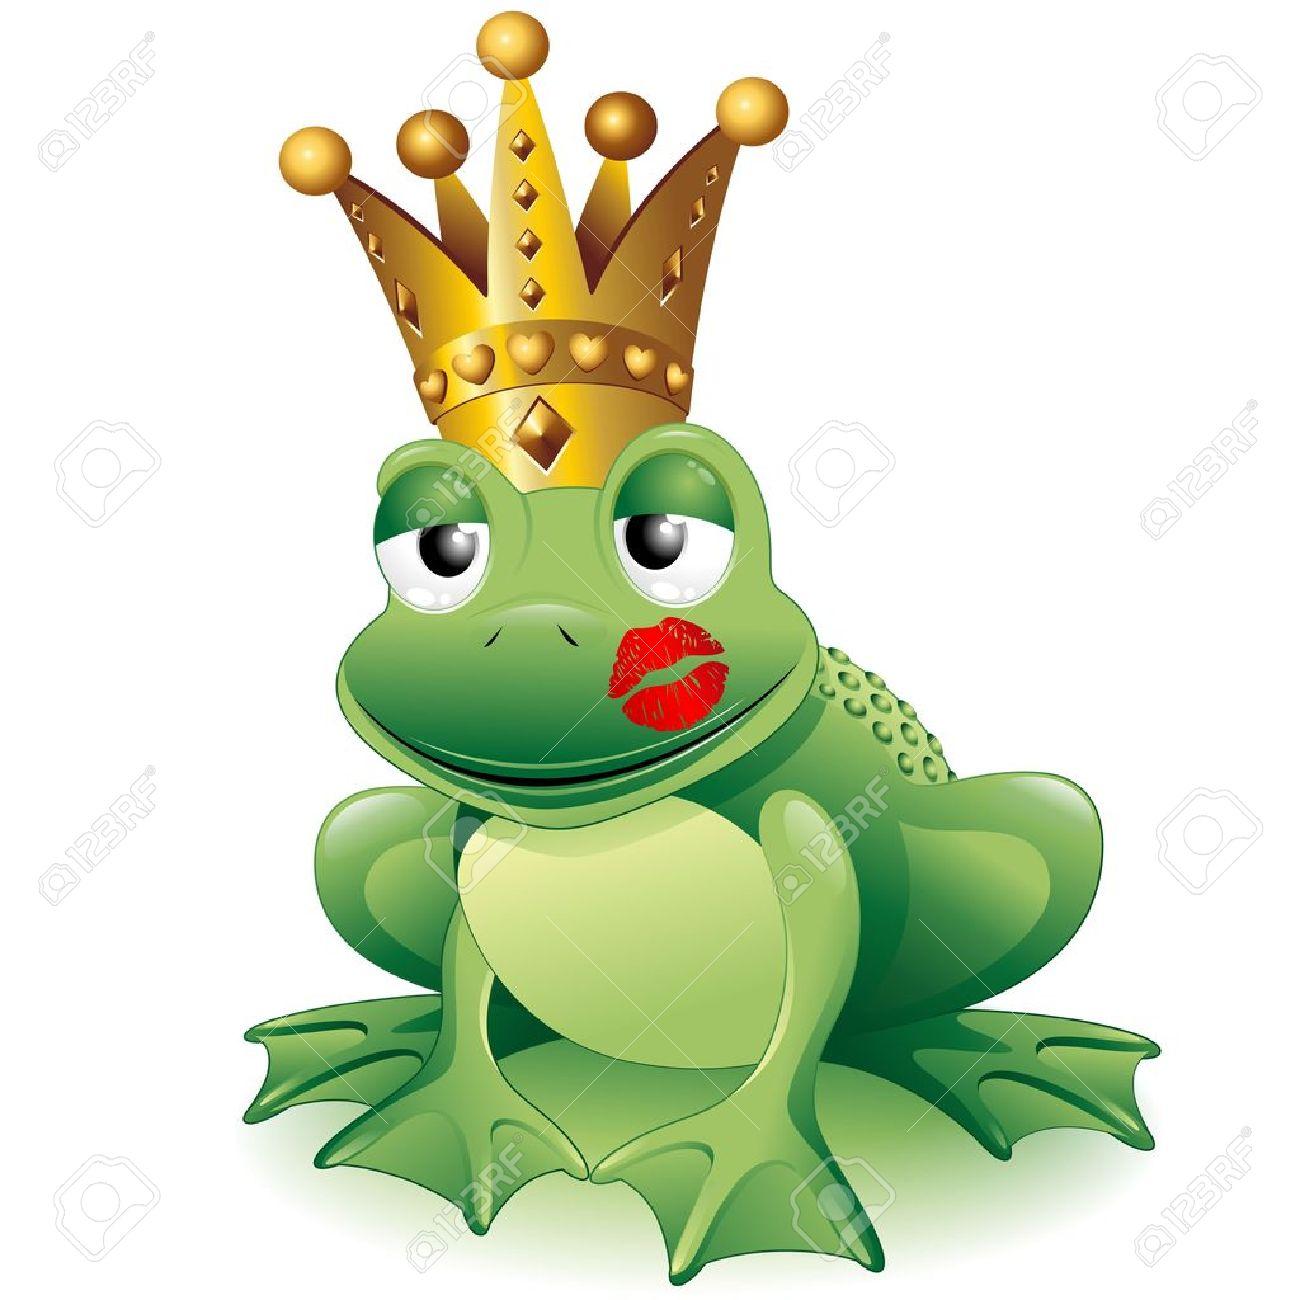 Prince Frog Cartoon Clip Art with Princess Kiss.